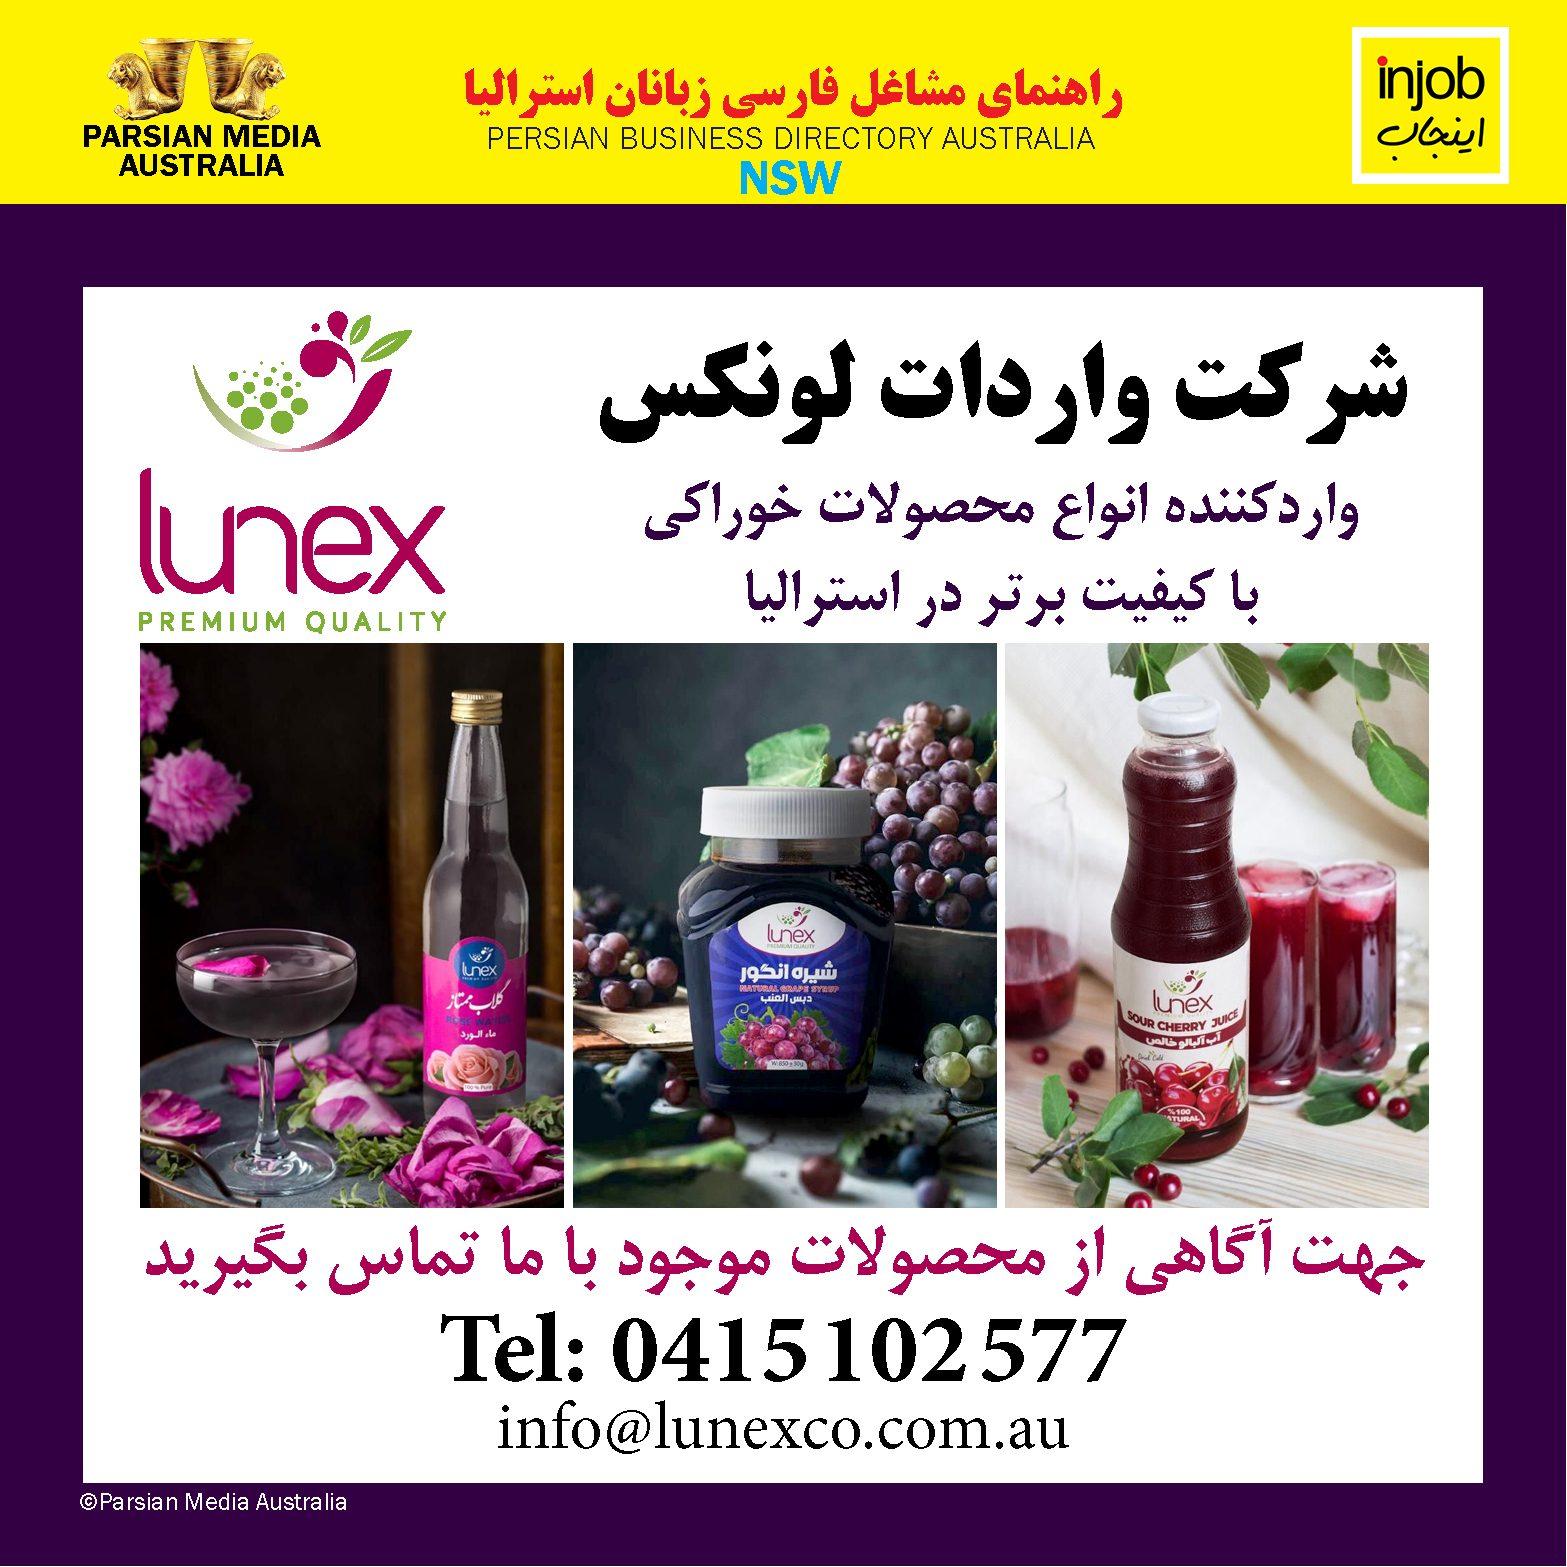 Lunex4-Injob-2021-2022-online.jpg